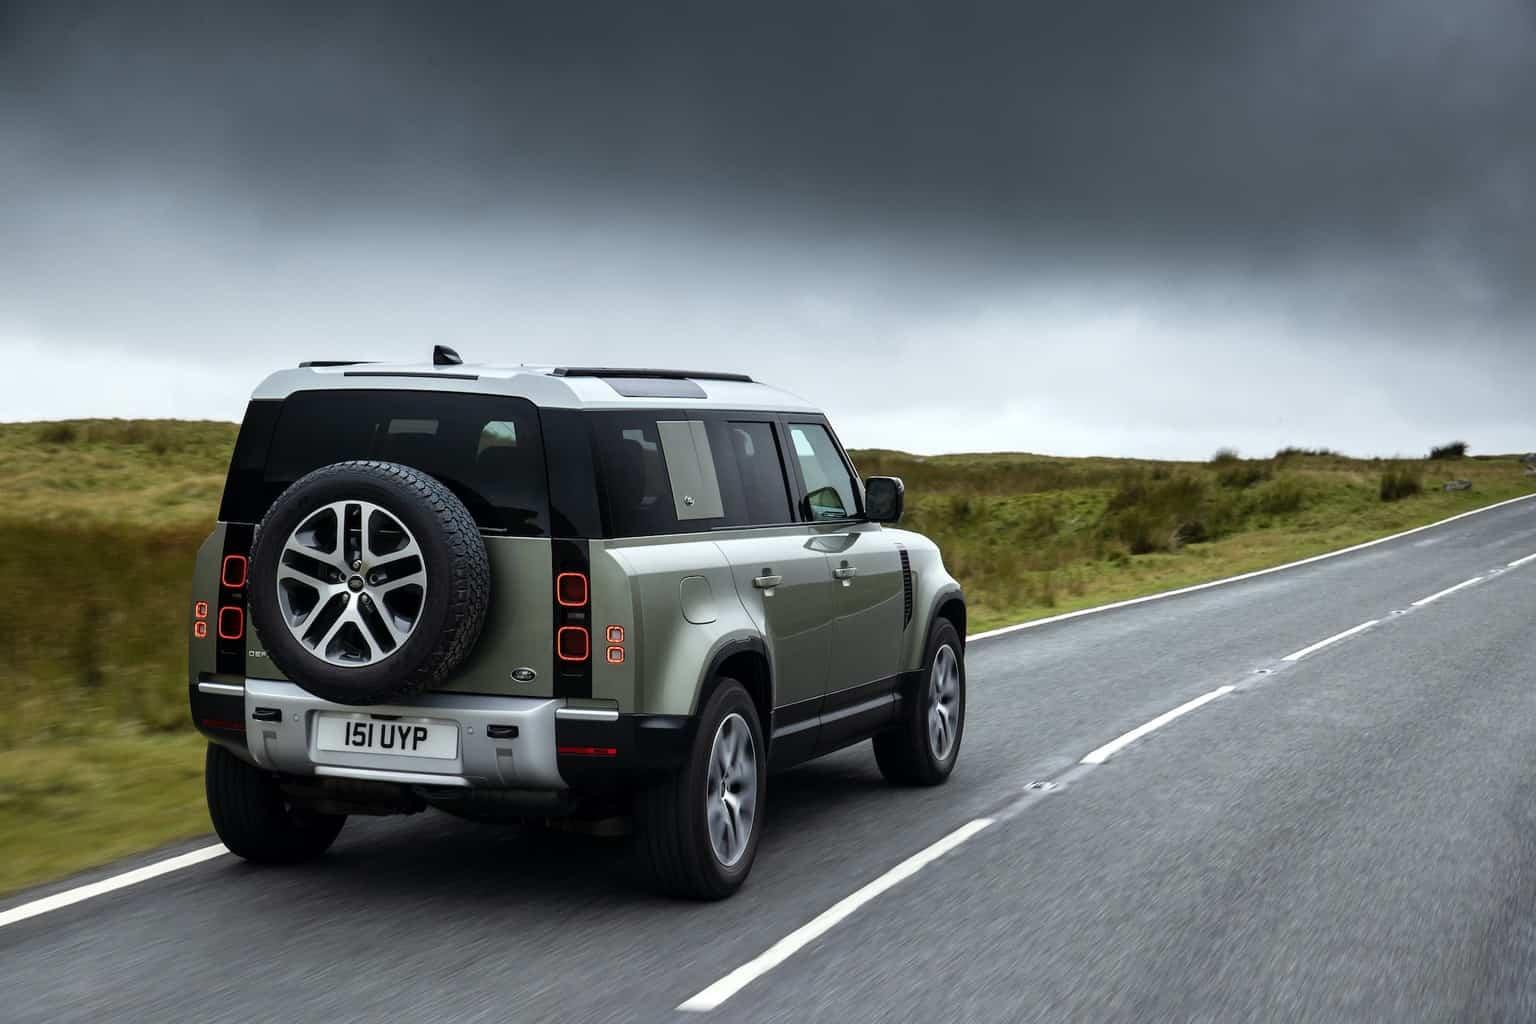 Land Rover Defender P400e Plug-in-Hybrid